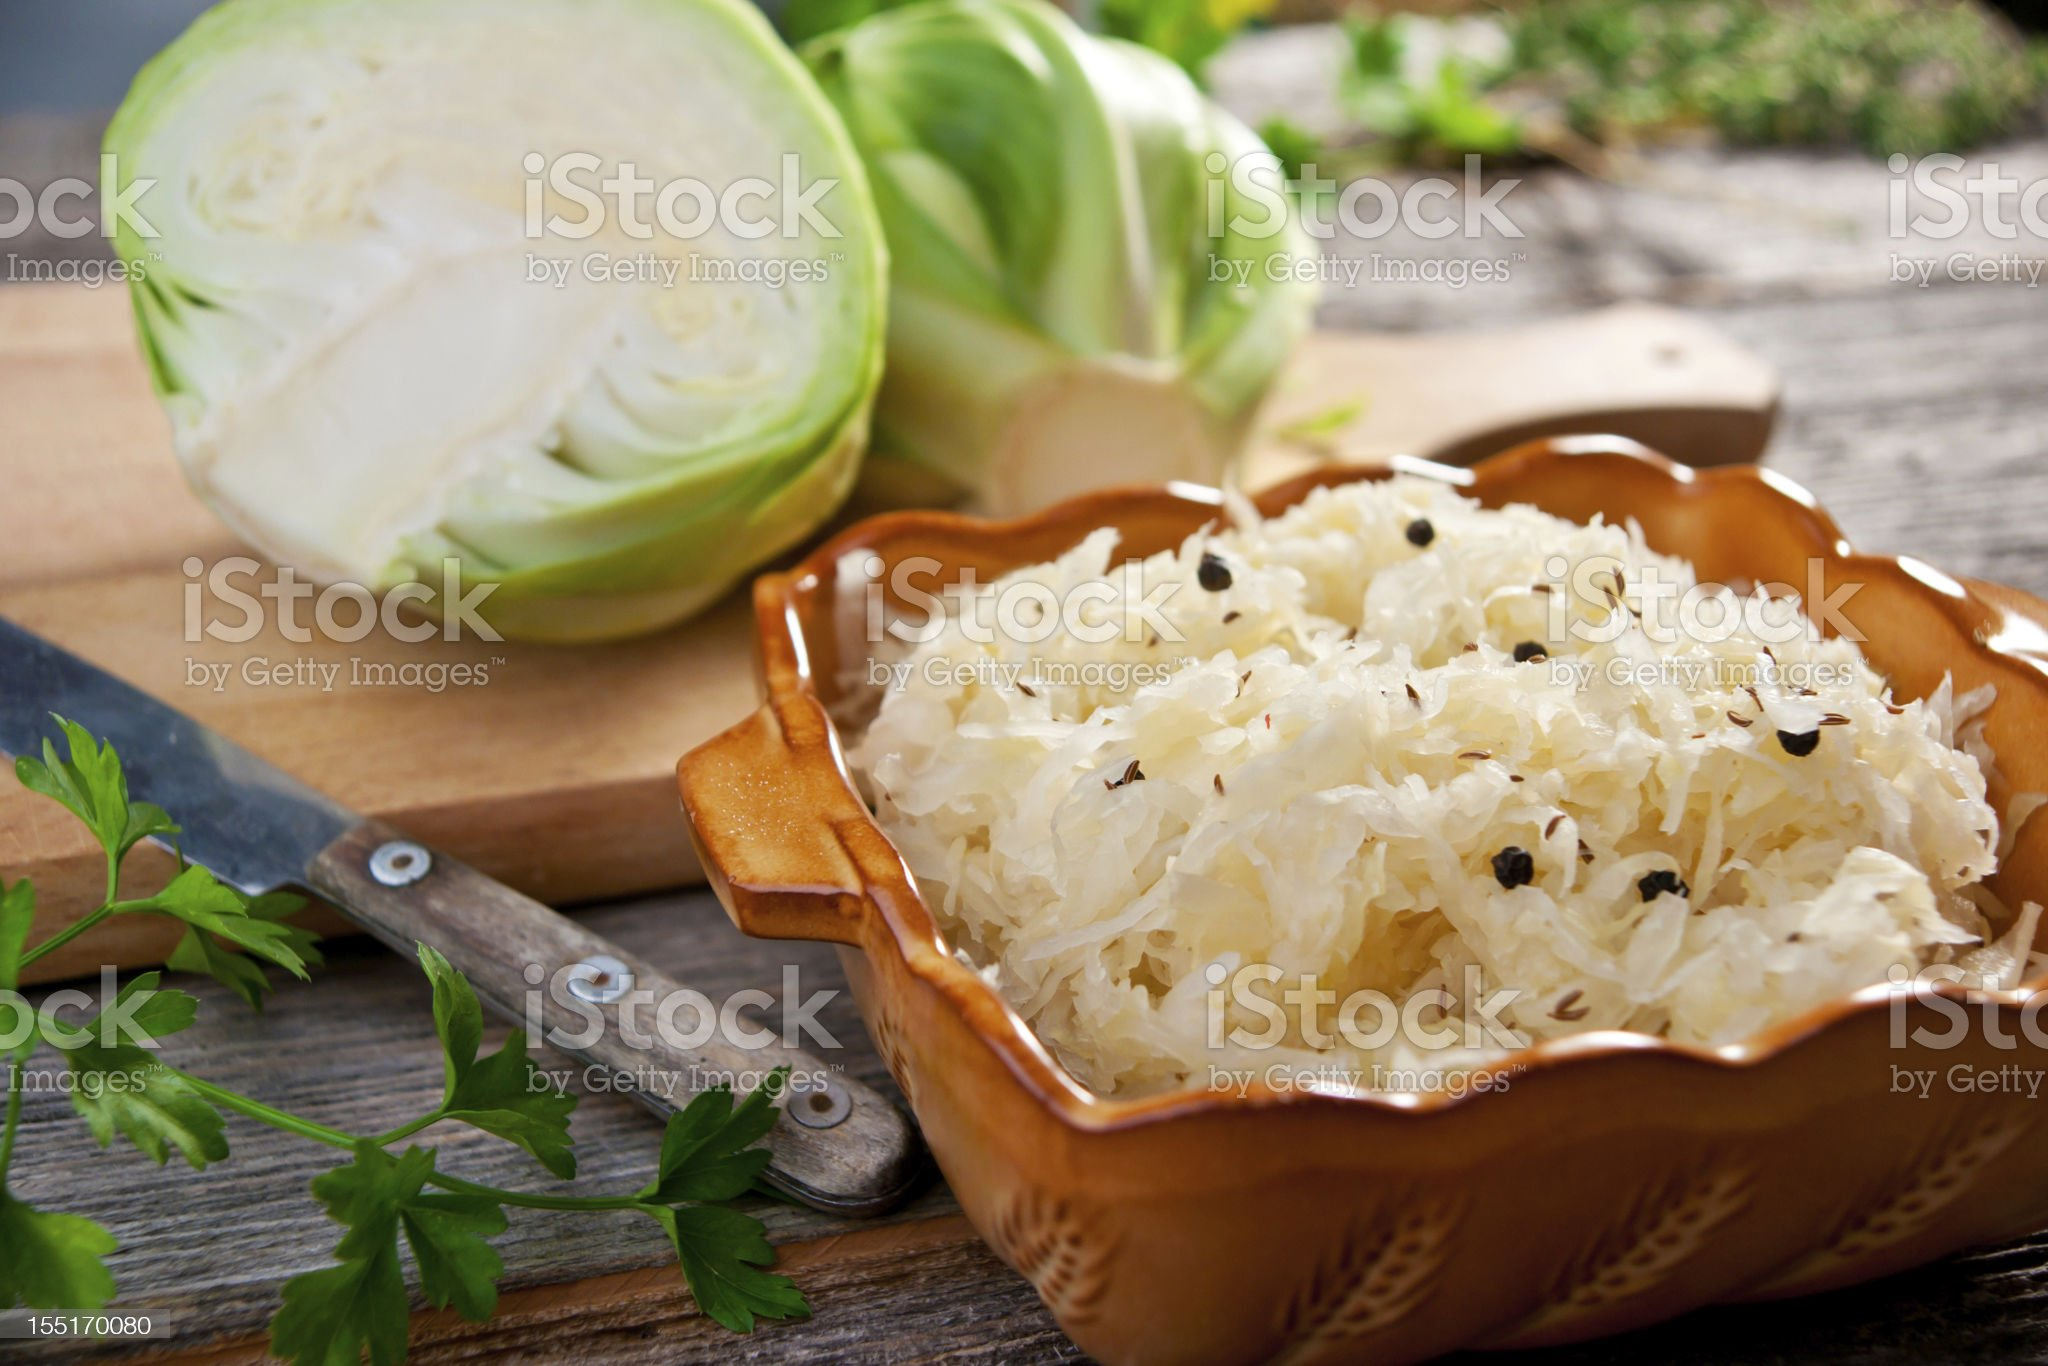 Sauerkraut royalty-free stock photo